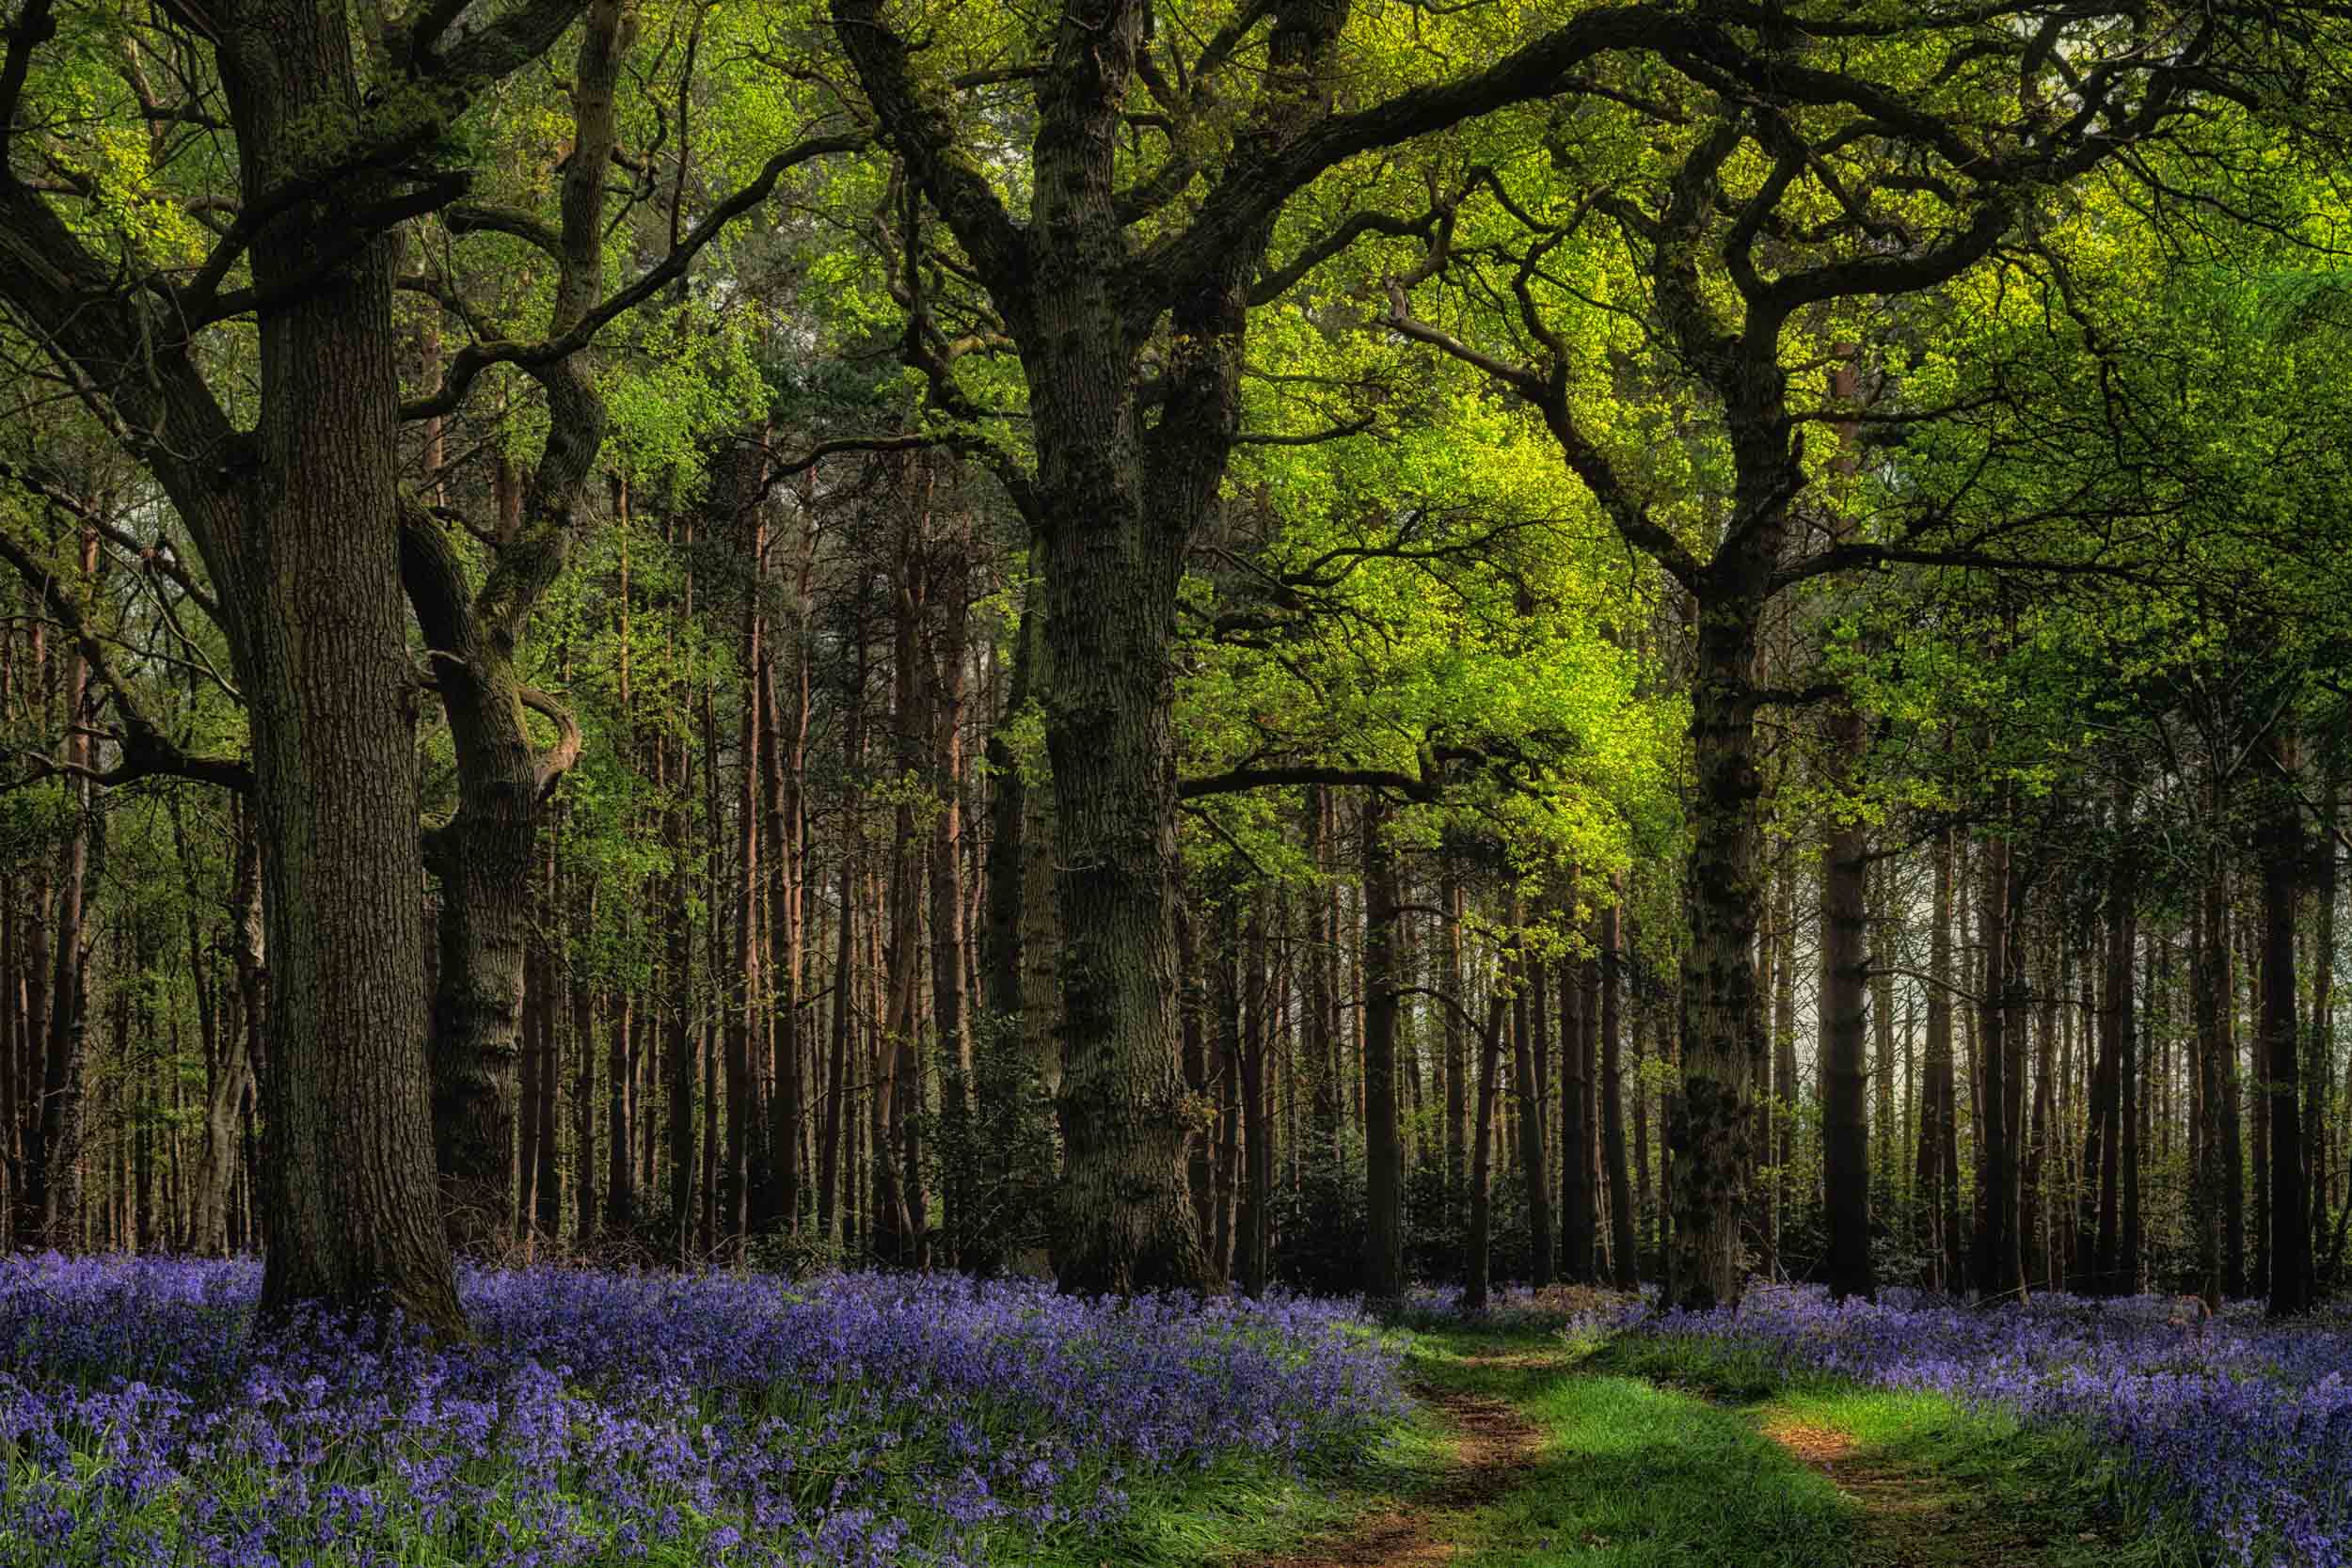 Bluebell Woods 2019